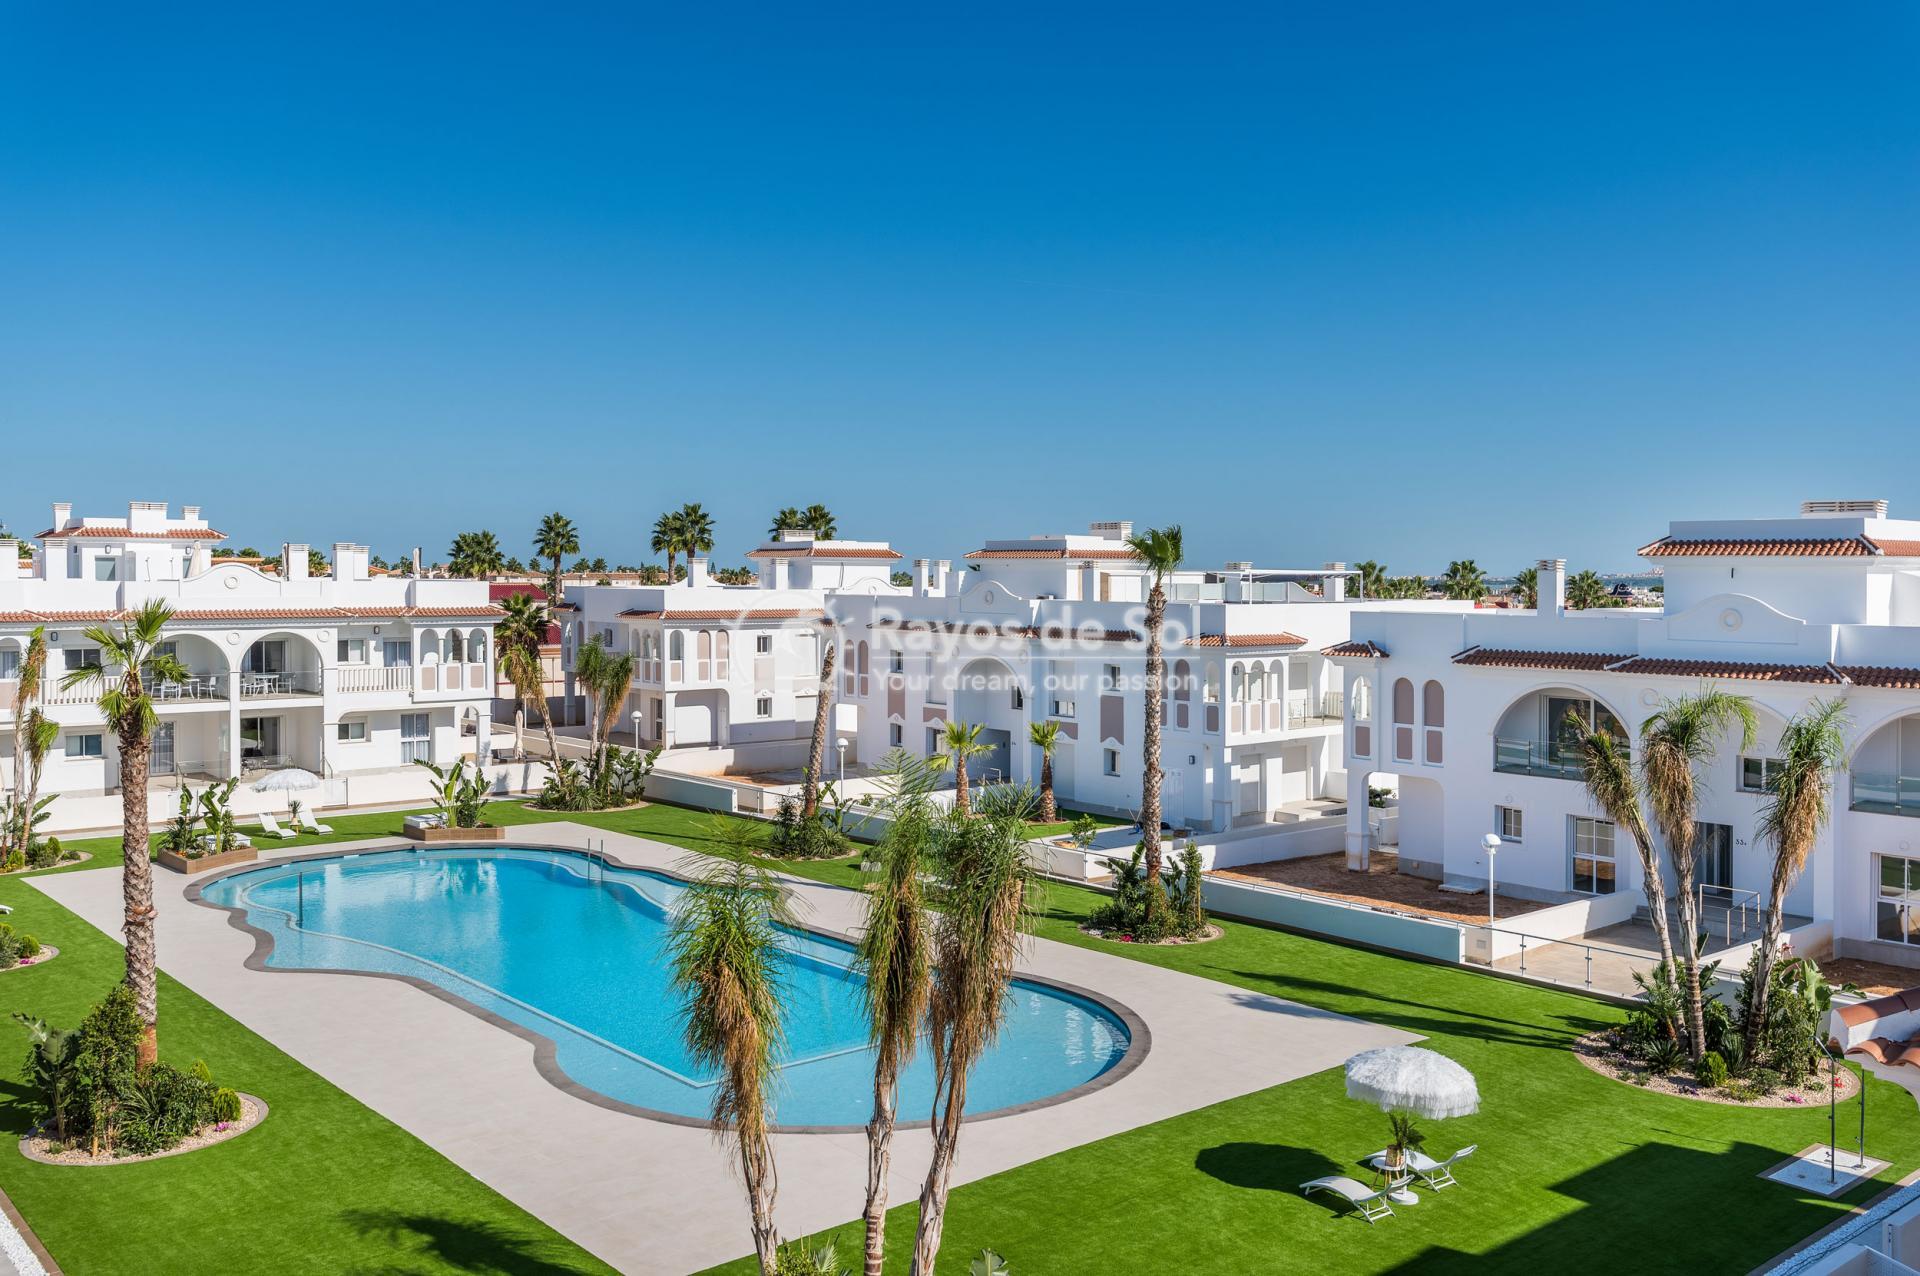 Apartment  in Doña Pepa, Quesada, Costa Blanca (Allegra-Alba-BG3) - 16